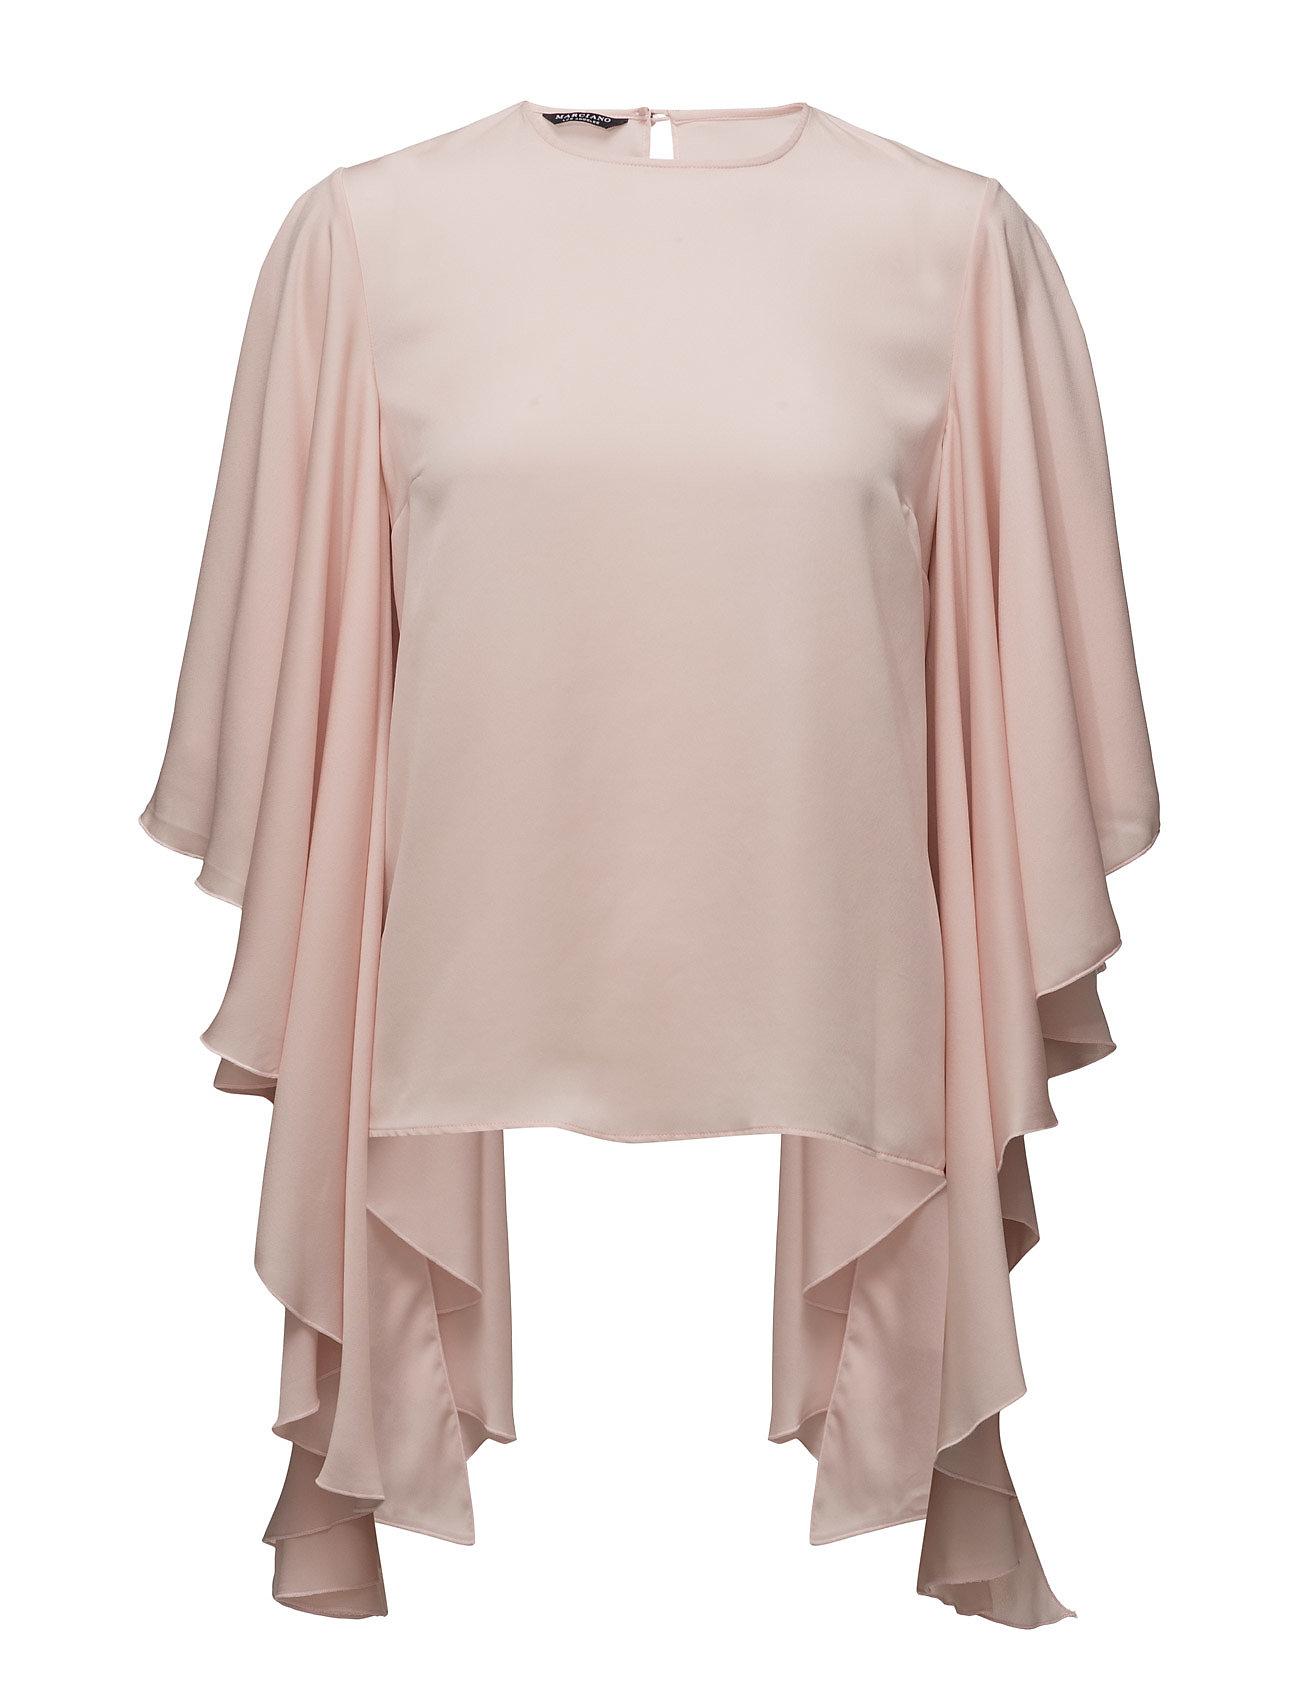 Sleevecut Ruffle Shirt Marciano by GUESS Langærmede til Damer i Peach Whip